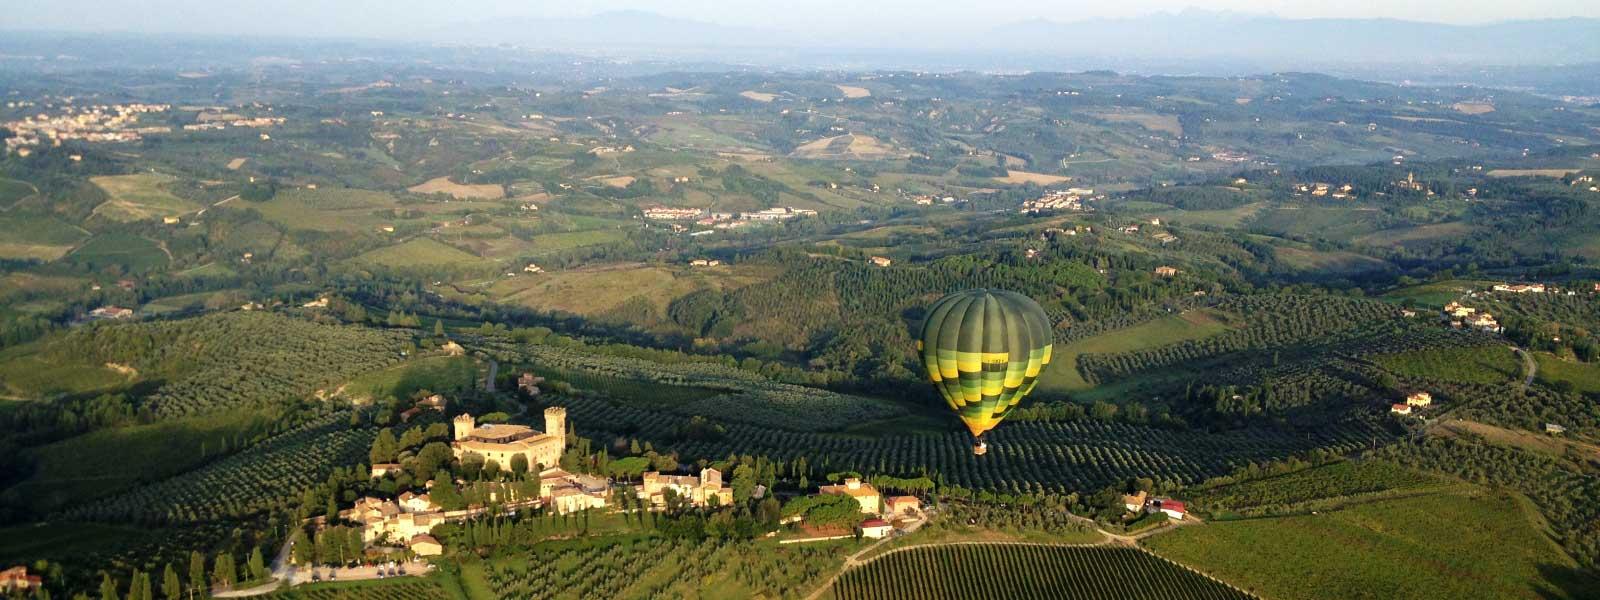 Castello-di-Poppiano-hot-air-ballooning